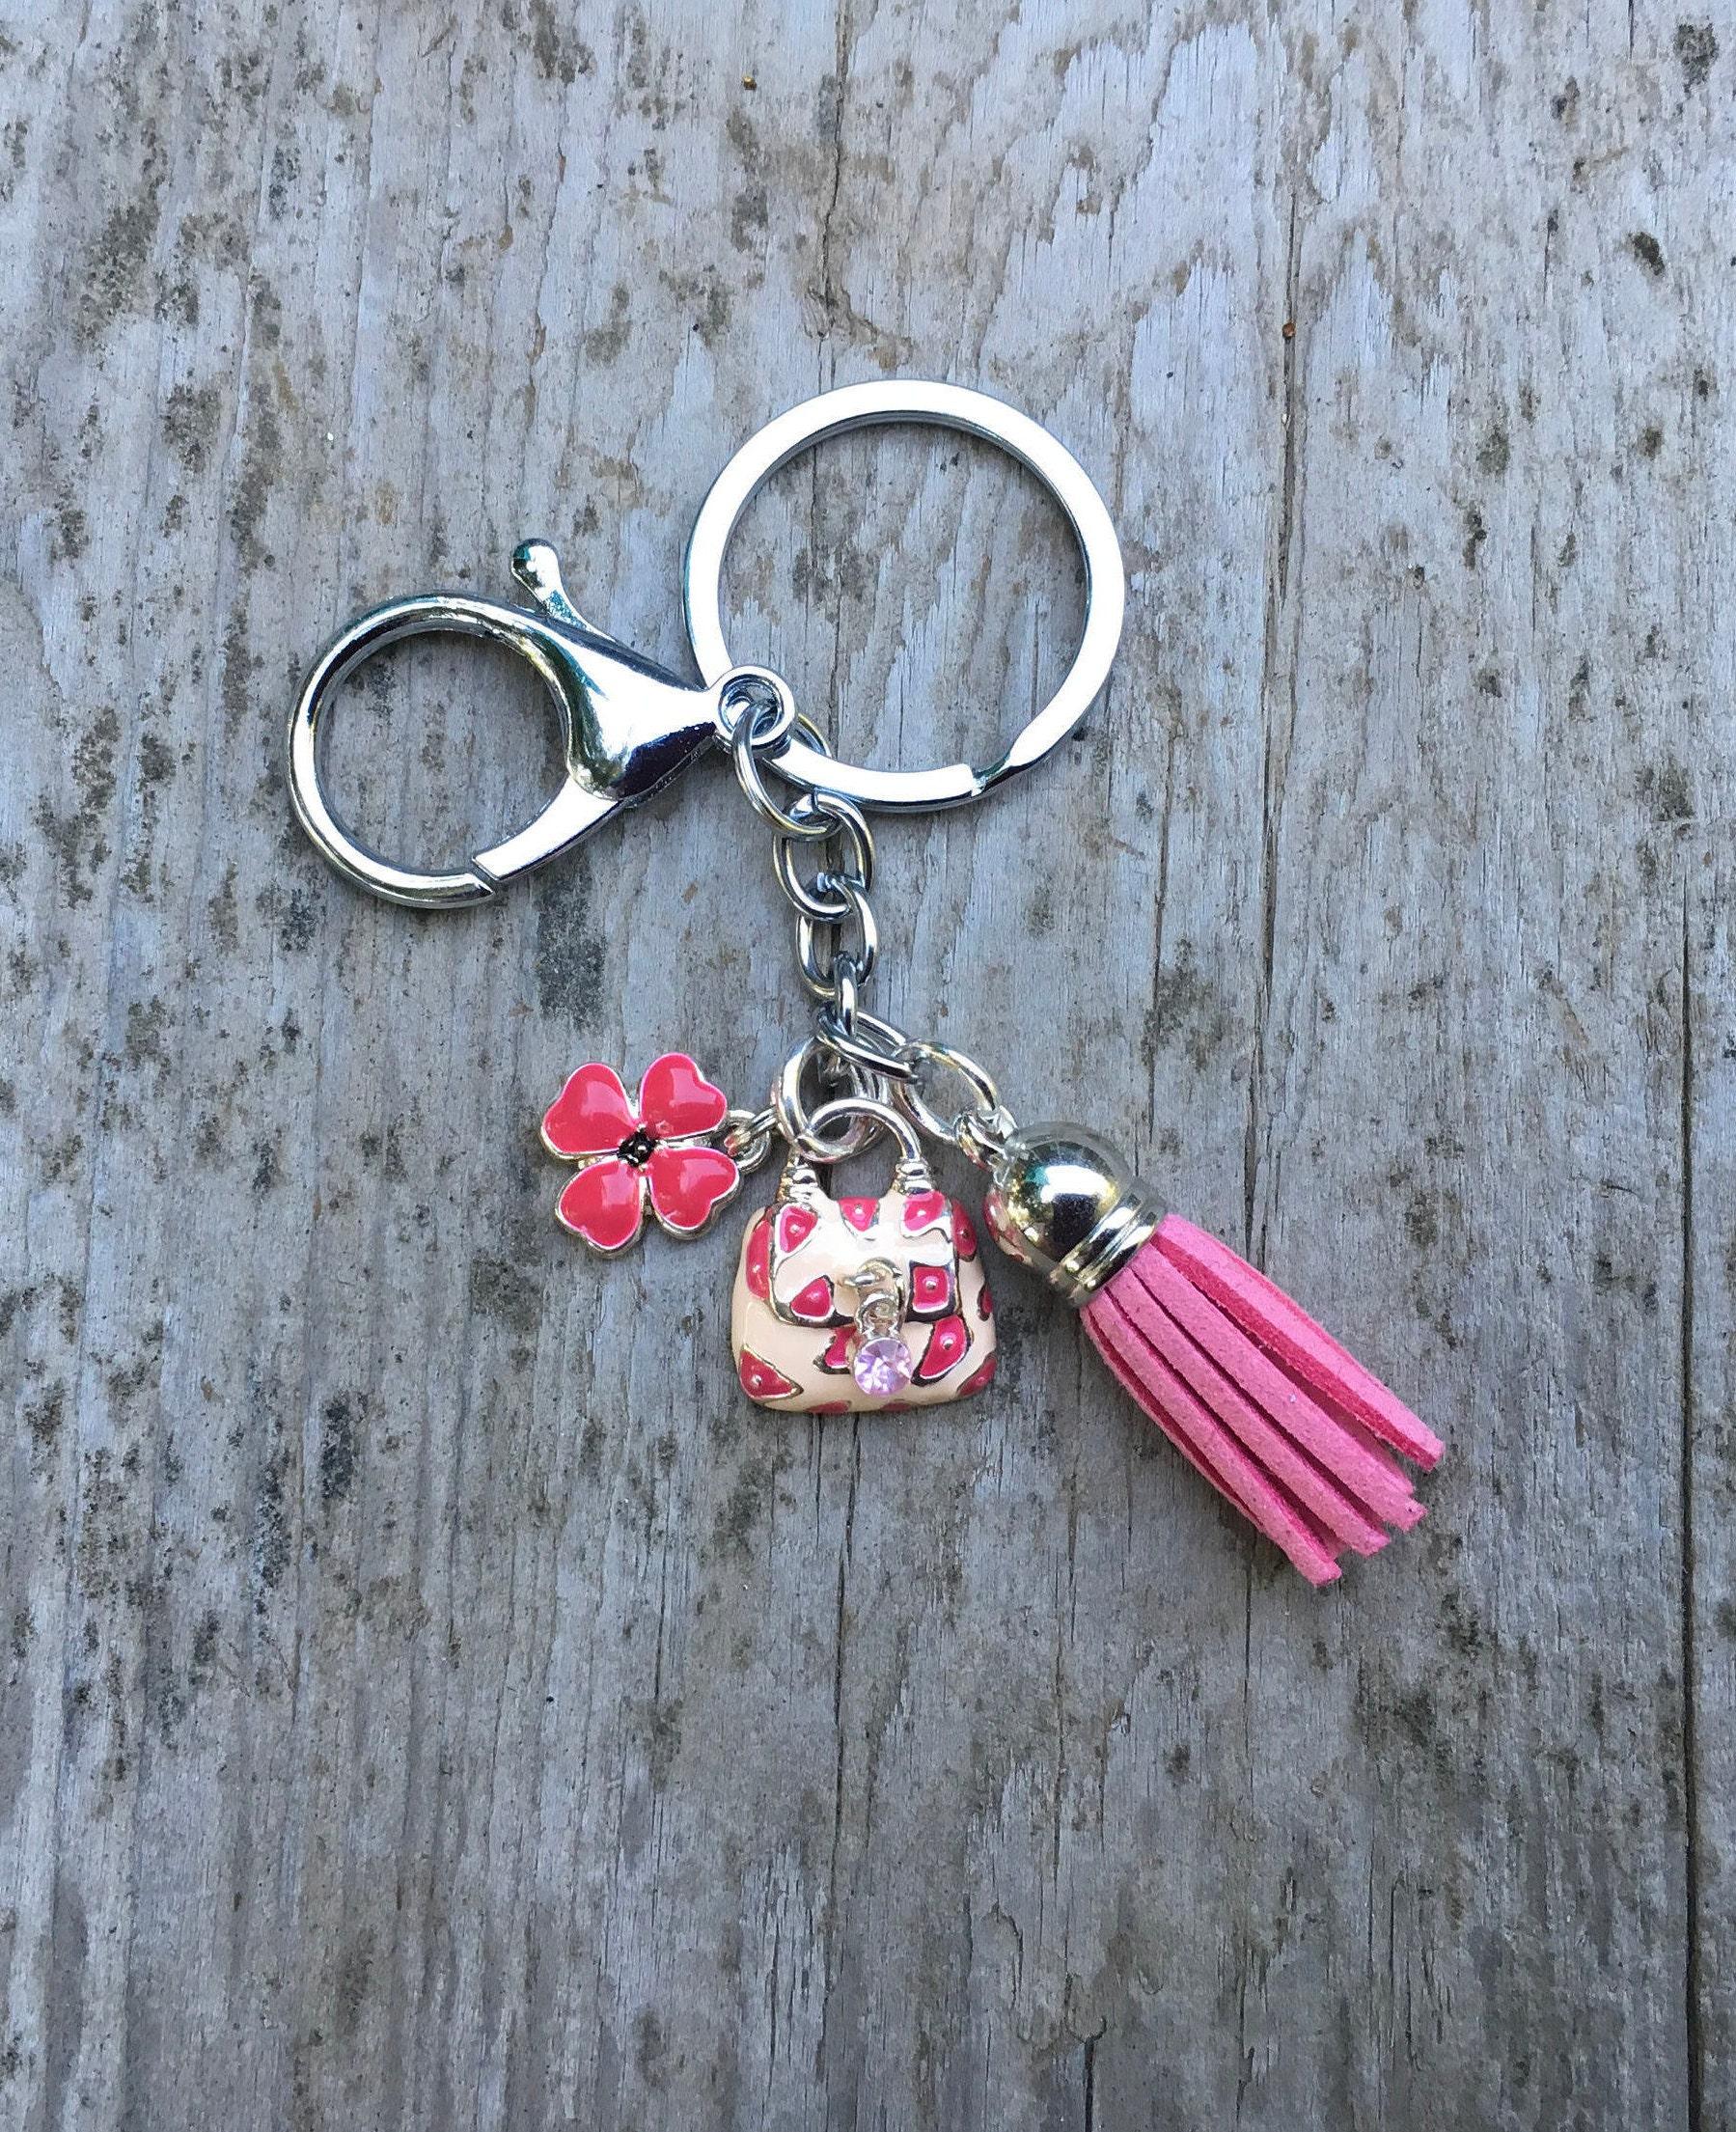 key chain charm key chain gift for women key fob cool key chain cute